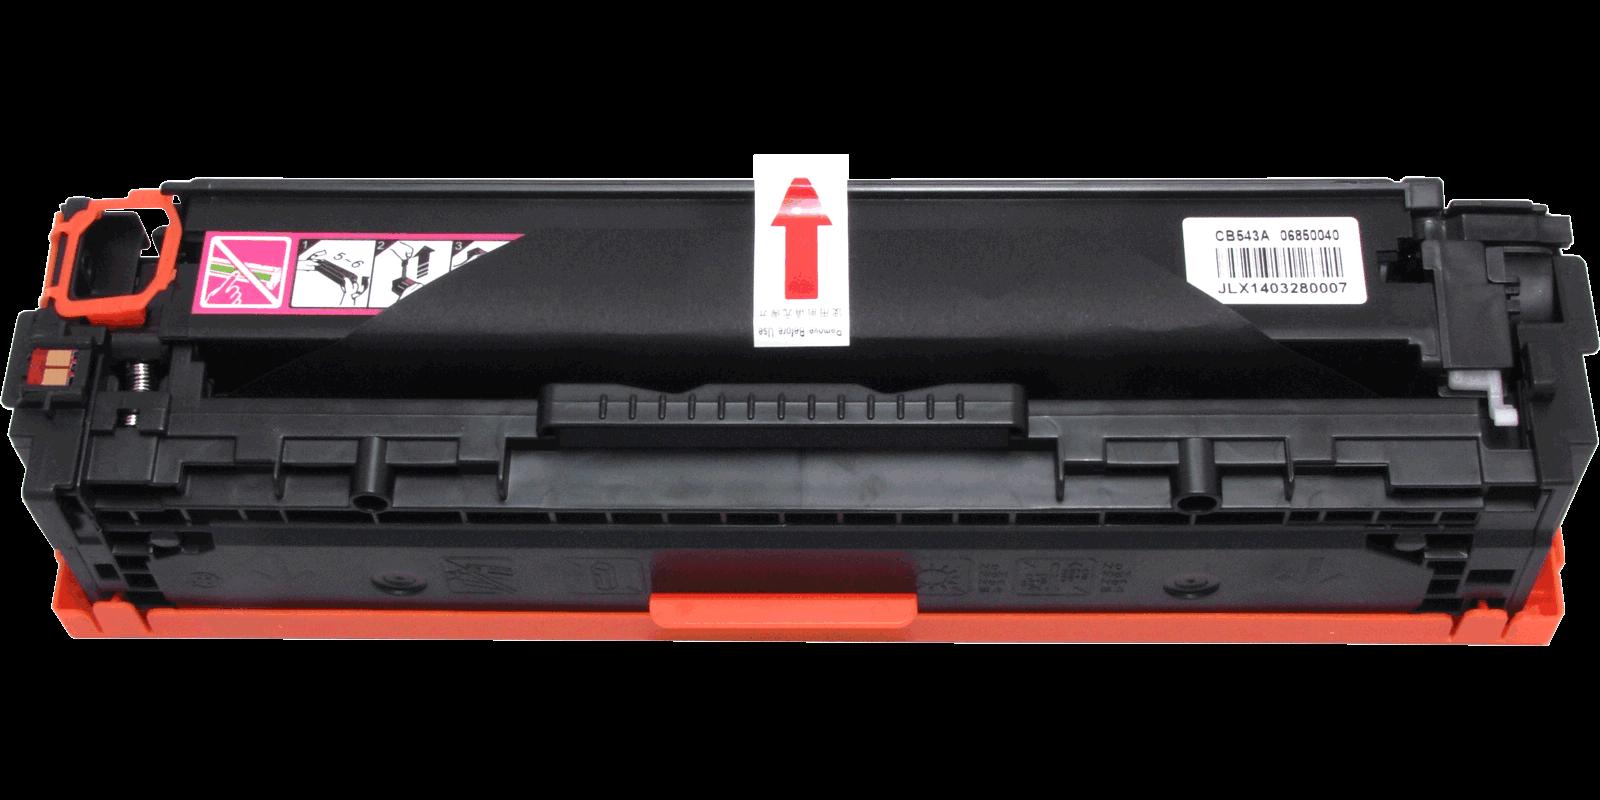 ULTRA №125A CB543A/Cartridge 316, 716, 416, 116 пурпурный (magenta), для HP/Canon, до 1400 стр.